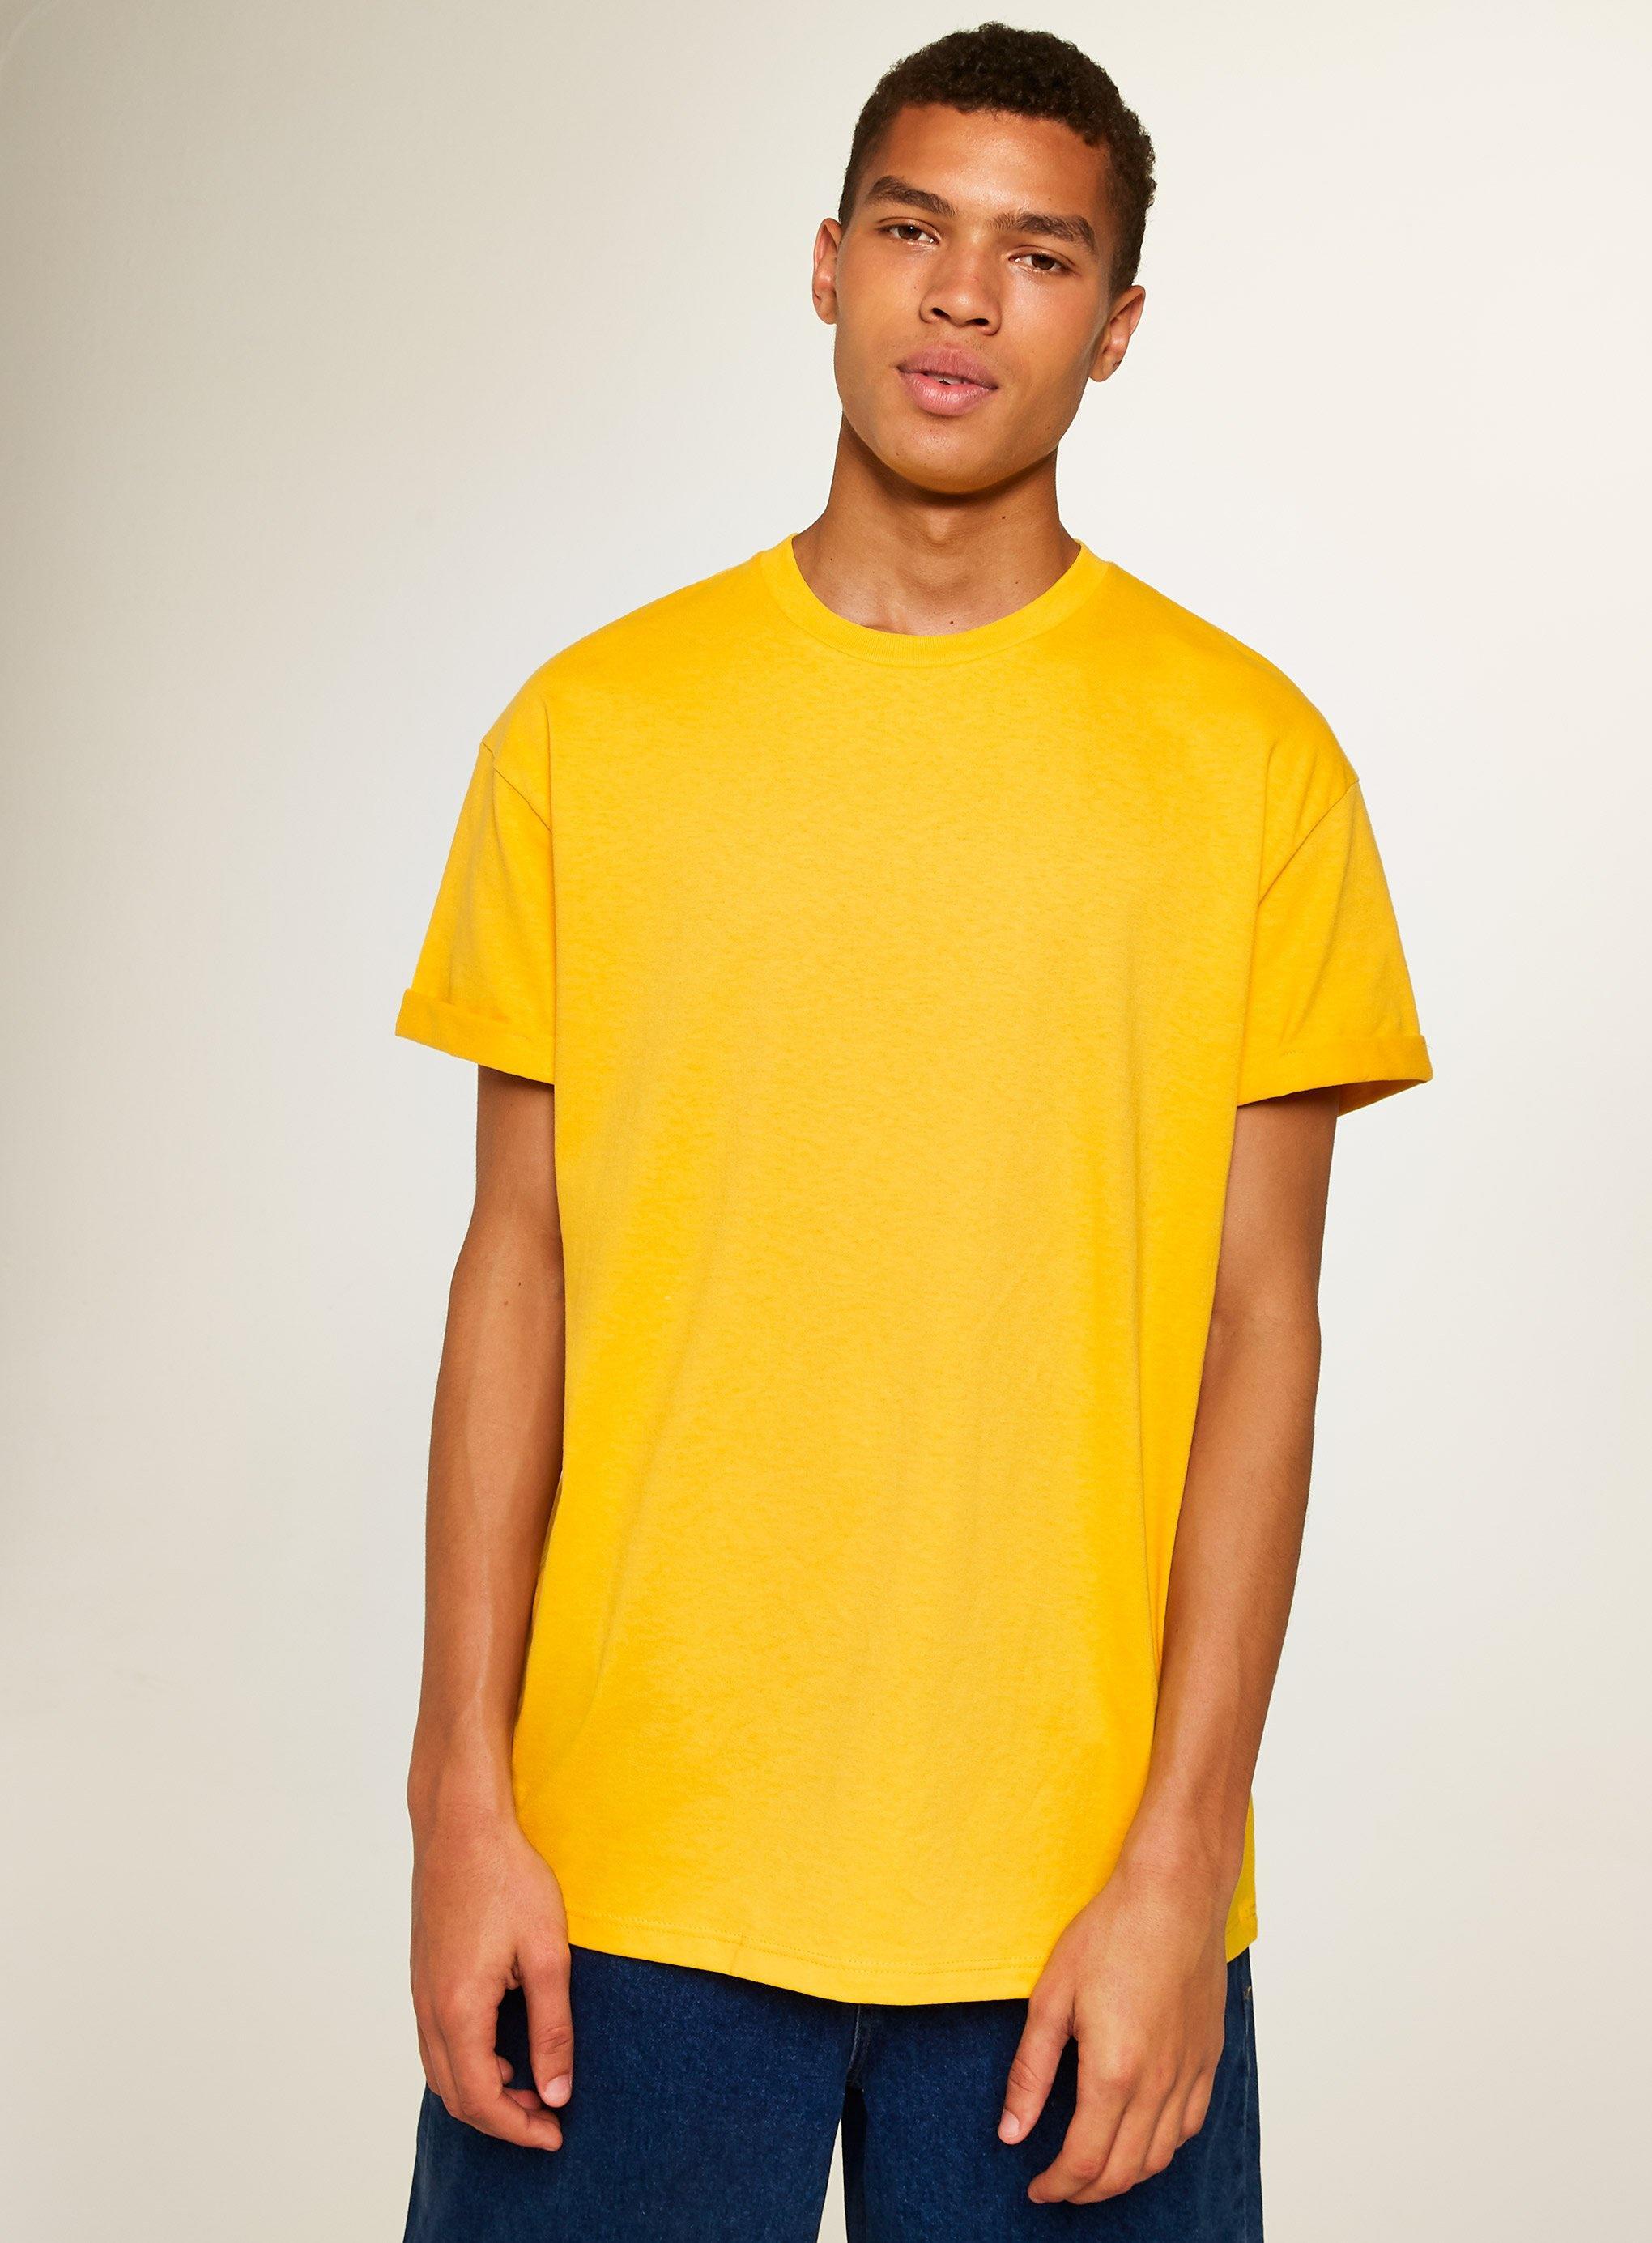 52e05345 TOPMAN Oversize Fit Roller T-shirt in Yellow for Men - Lyst